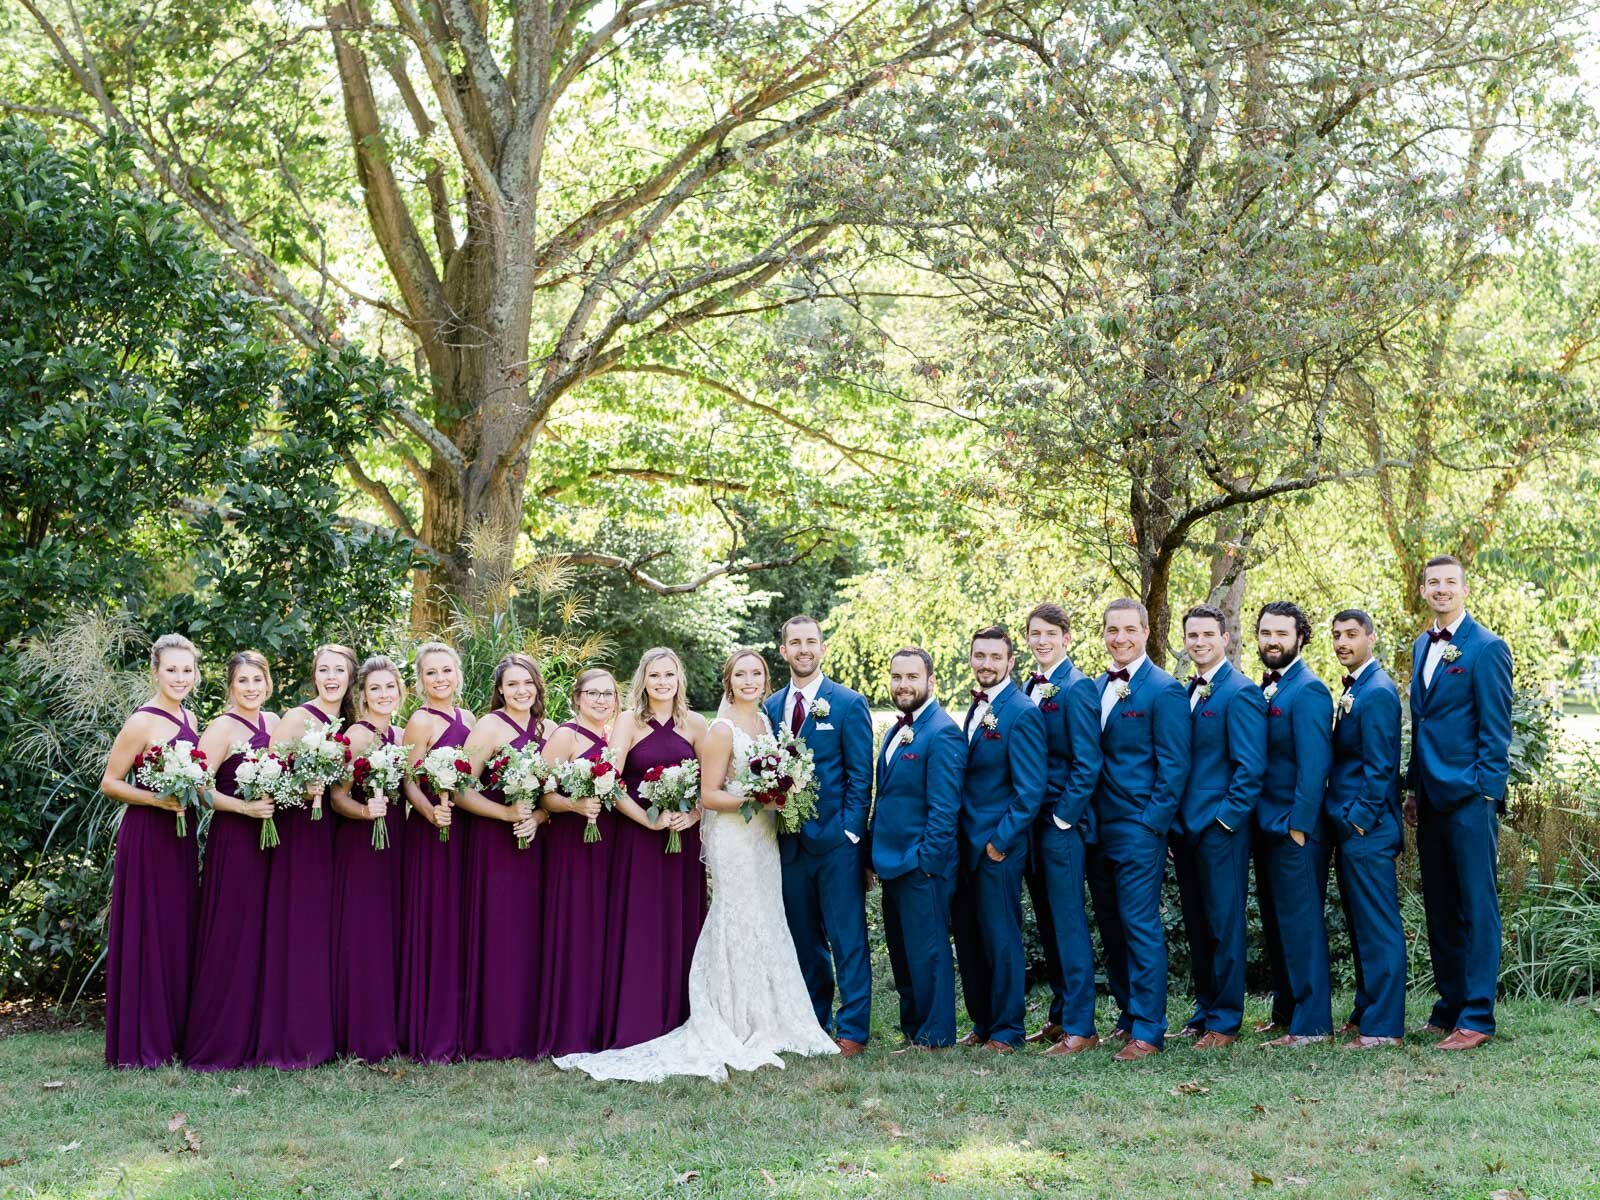 Elegant and Joyful Wedding at Crago Farms in Columbus, Ohio-33.jpg